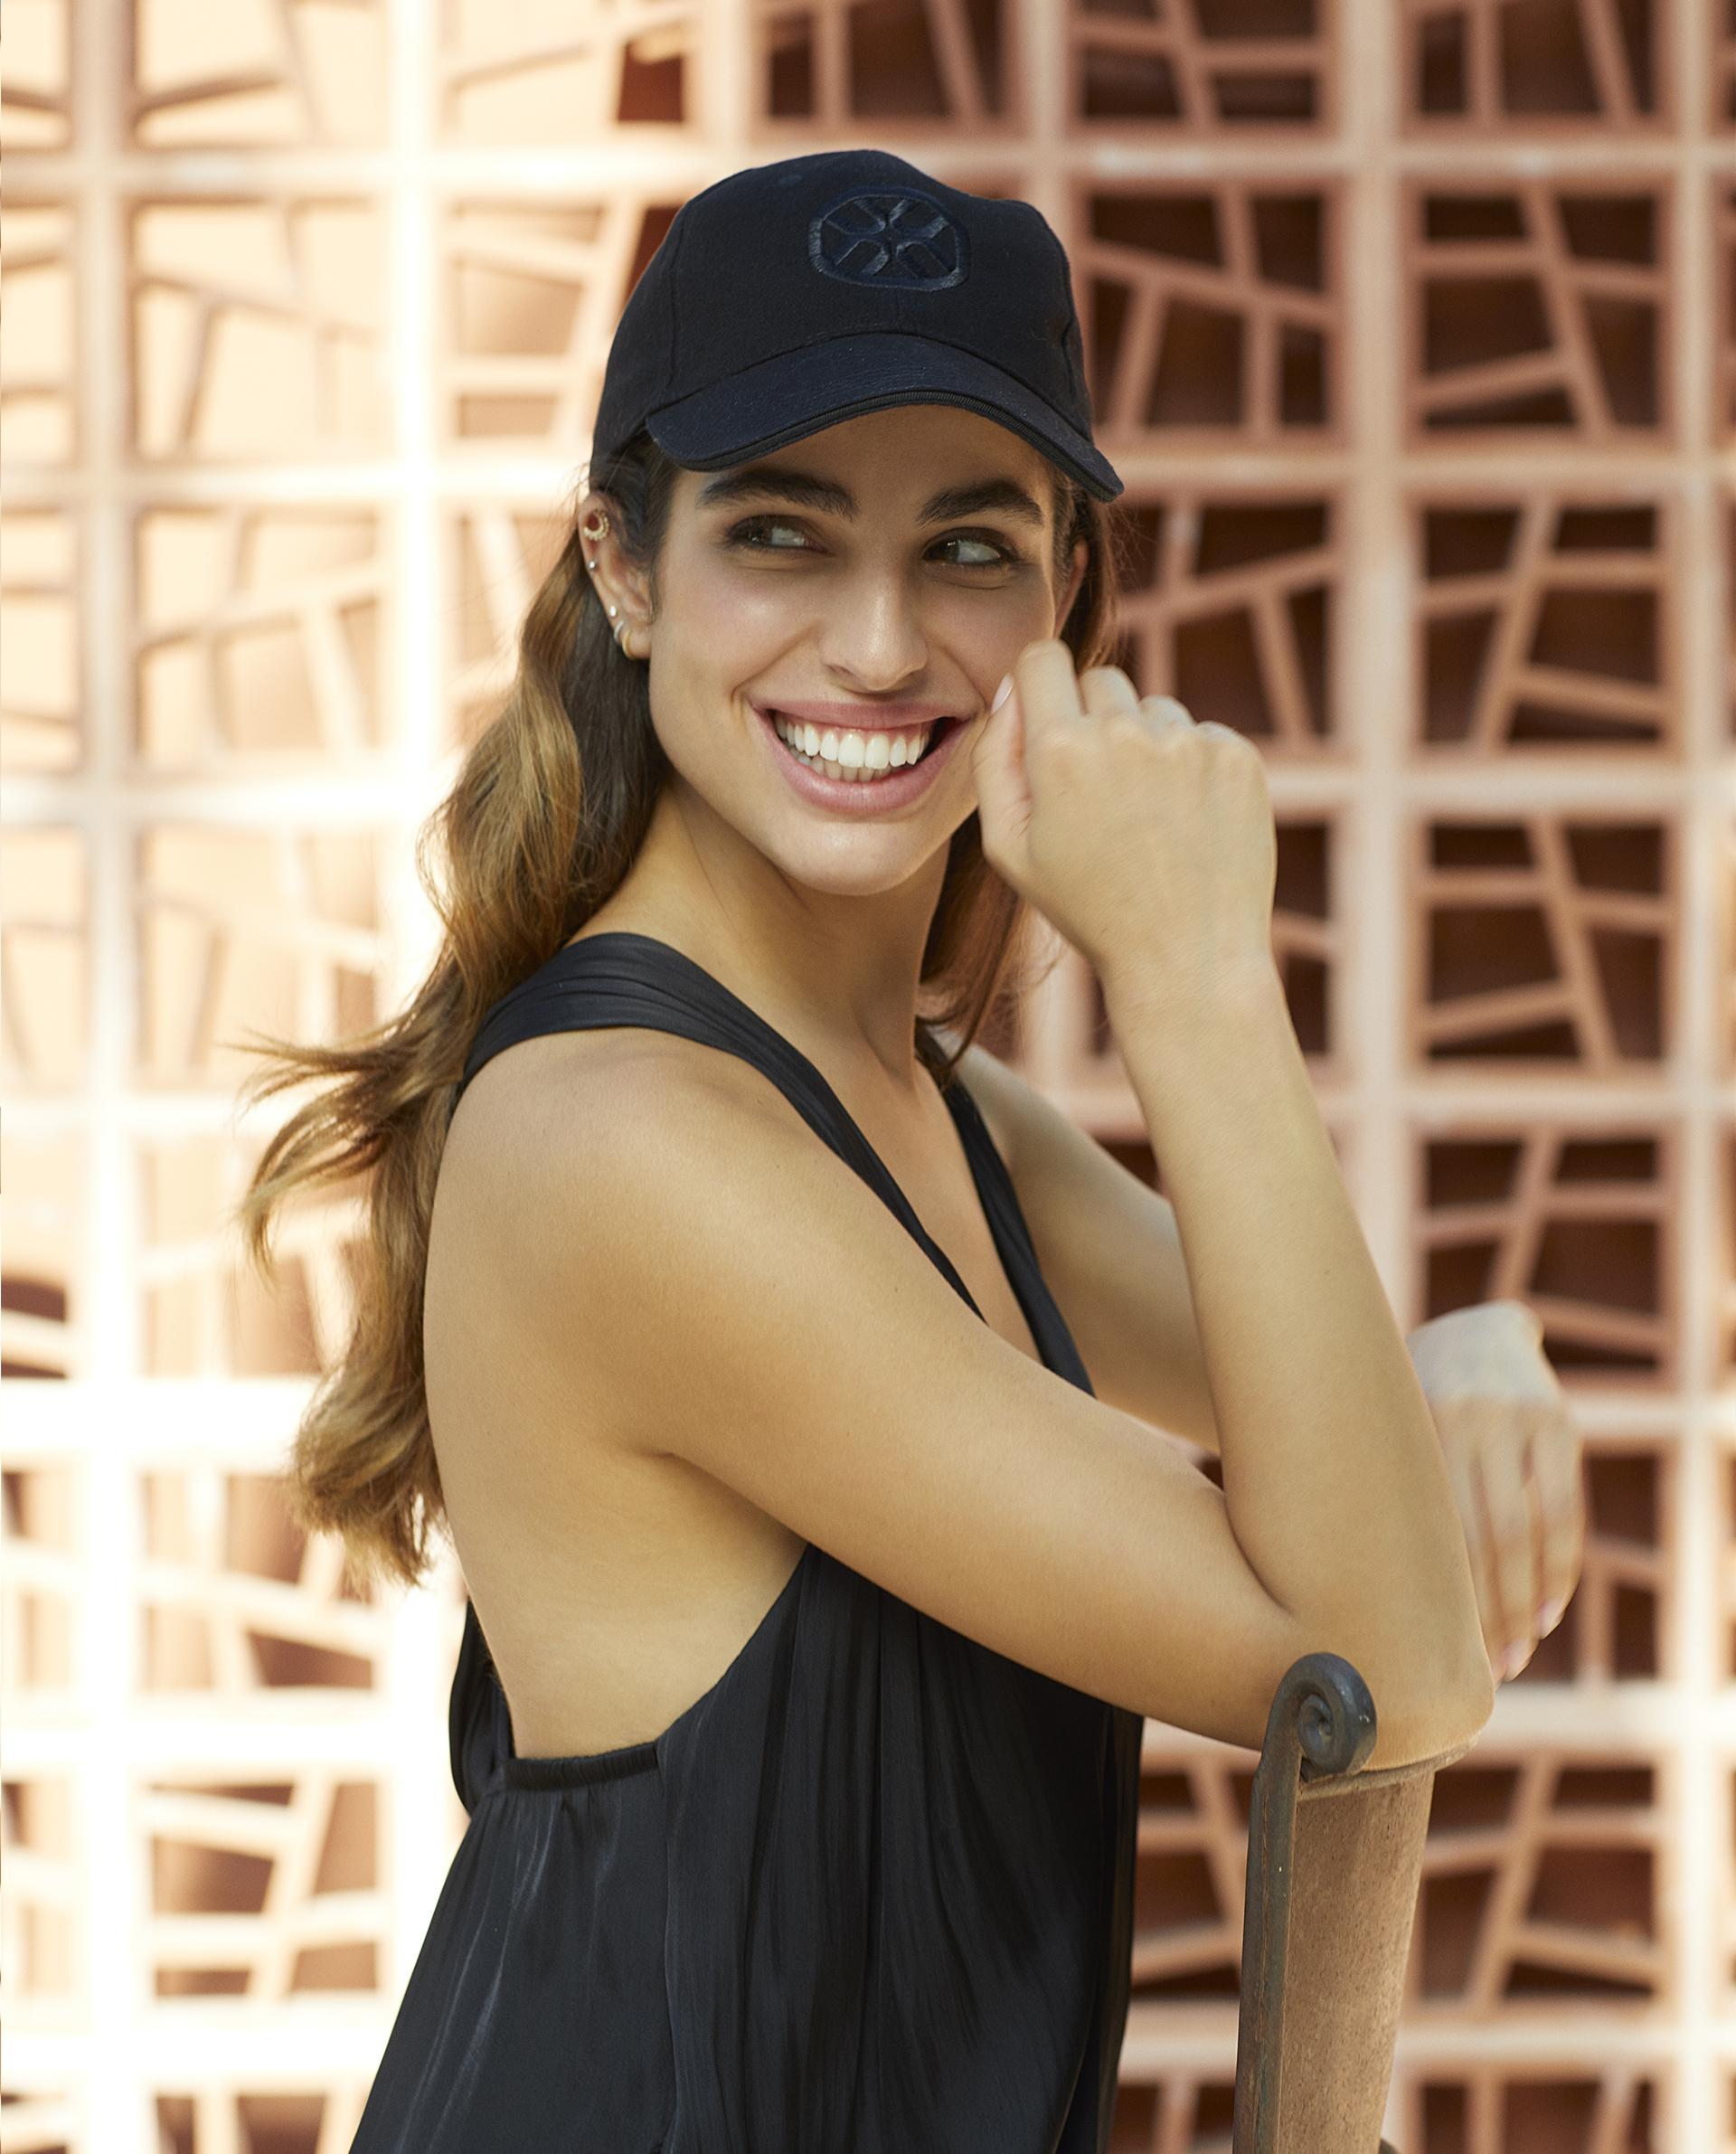 Unisa Gorras y sombreros GORRA_UNI black 6